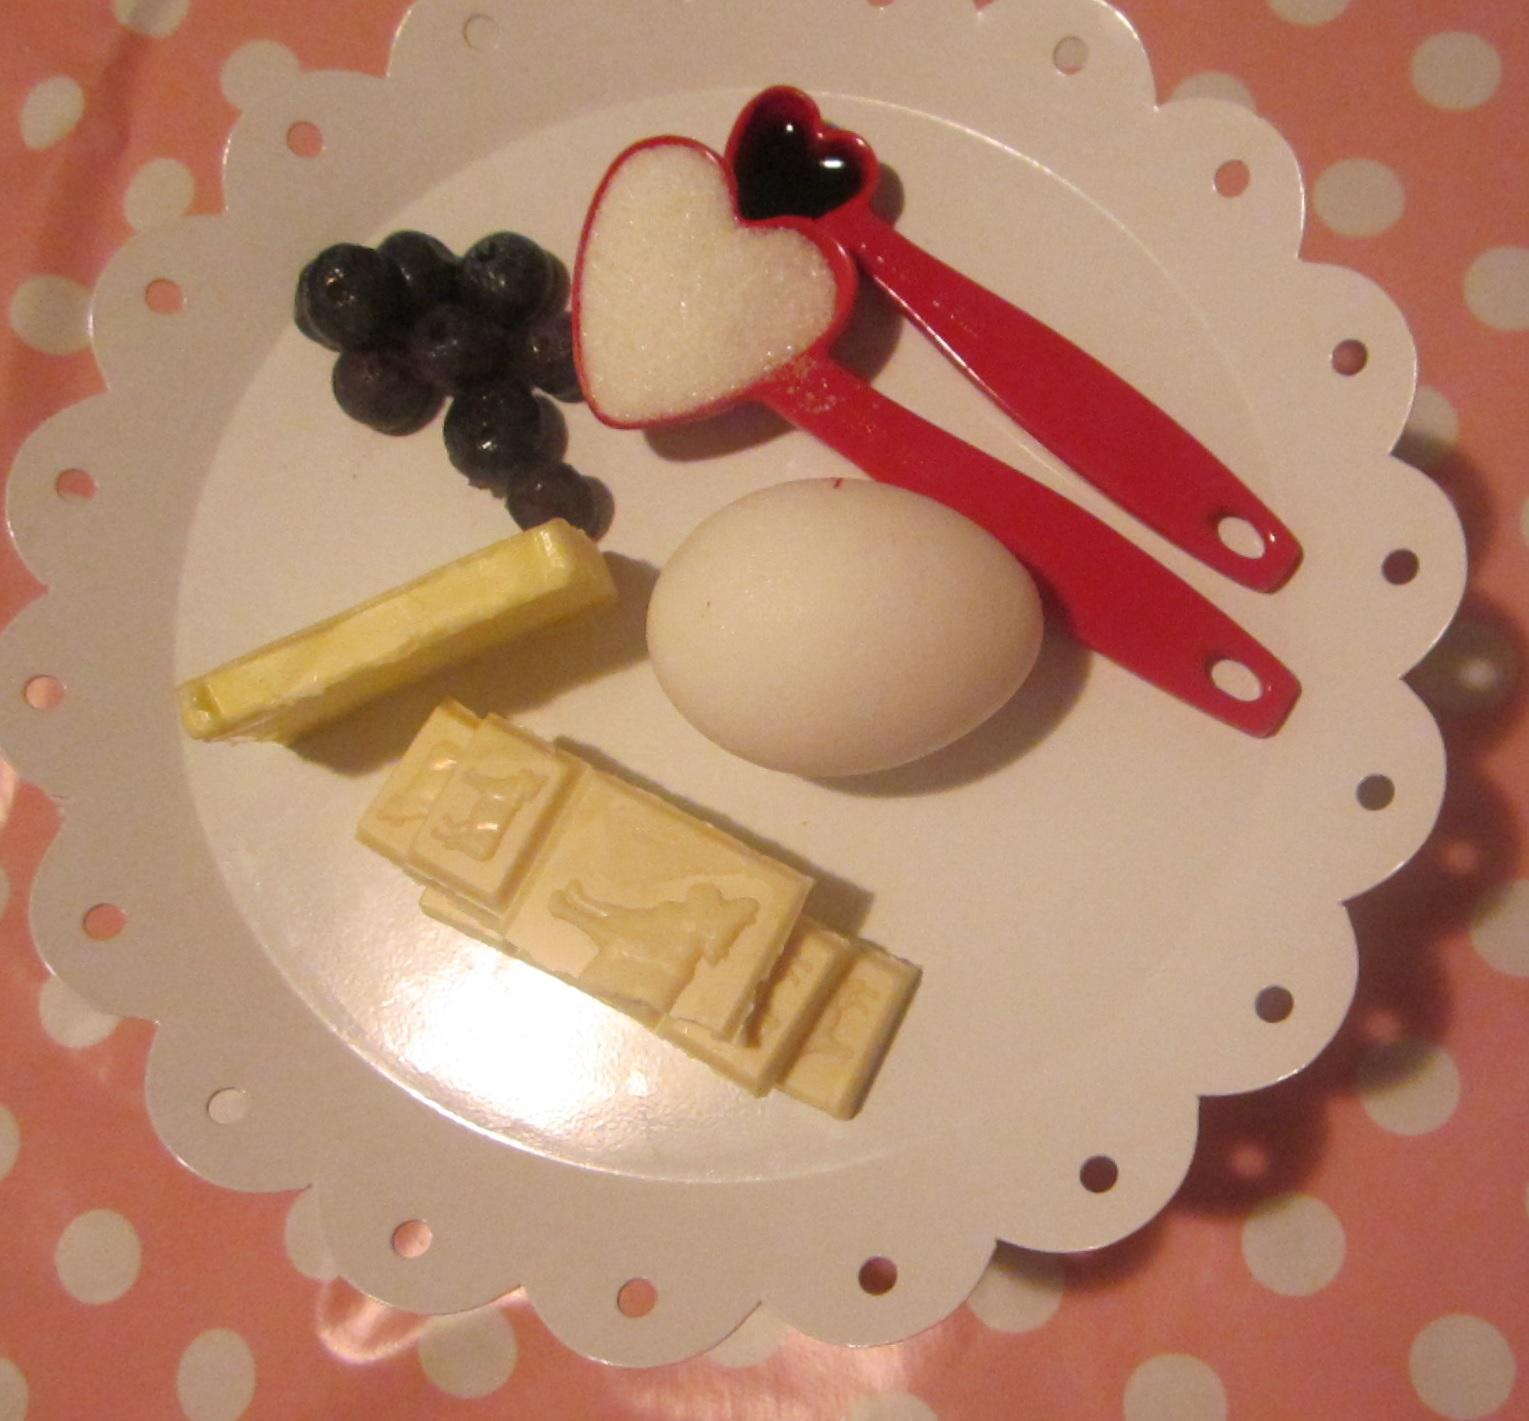 White Chocolate & Blueberry Souffle